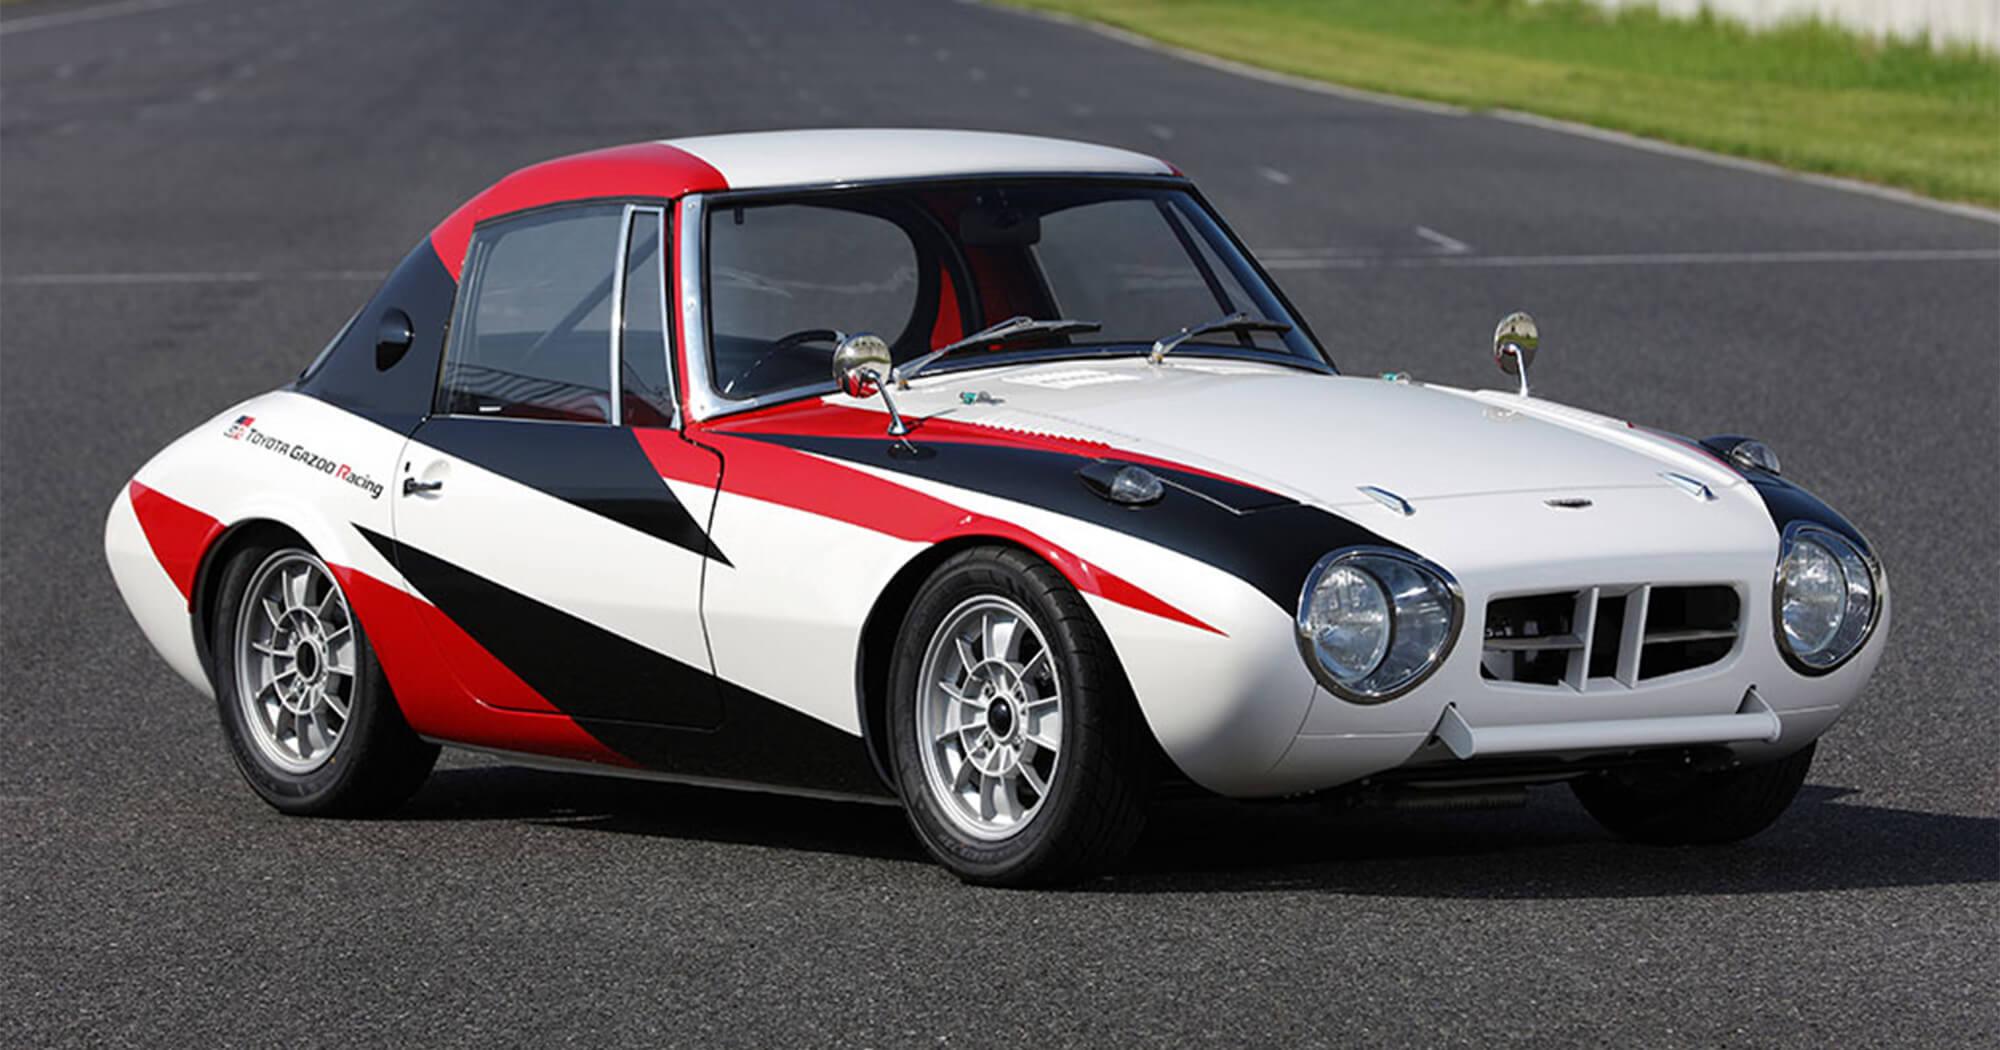 gr concept ヨタハチ レーシング 復活プロジェクト toyota gazoo racing